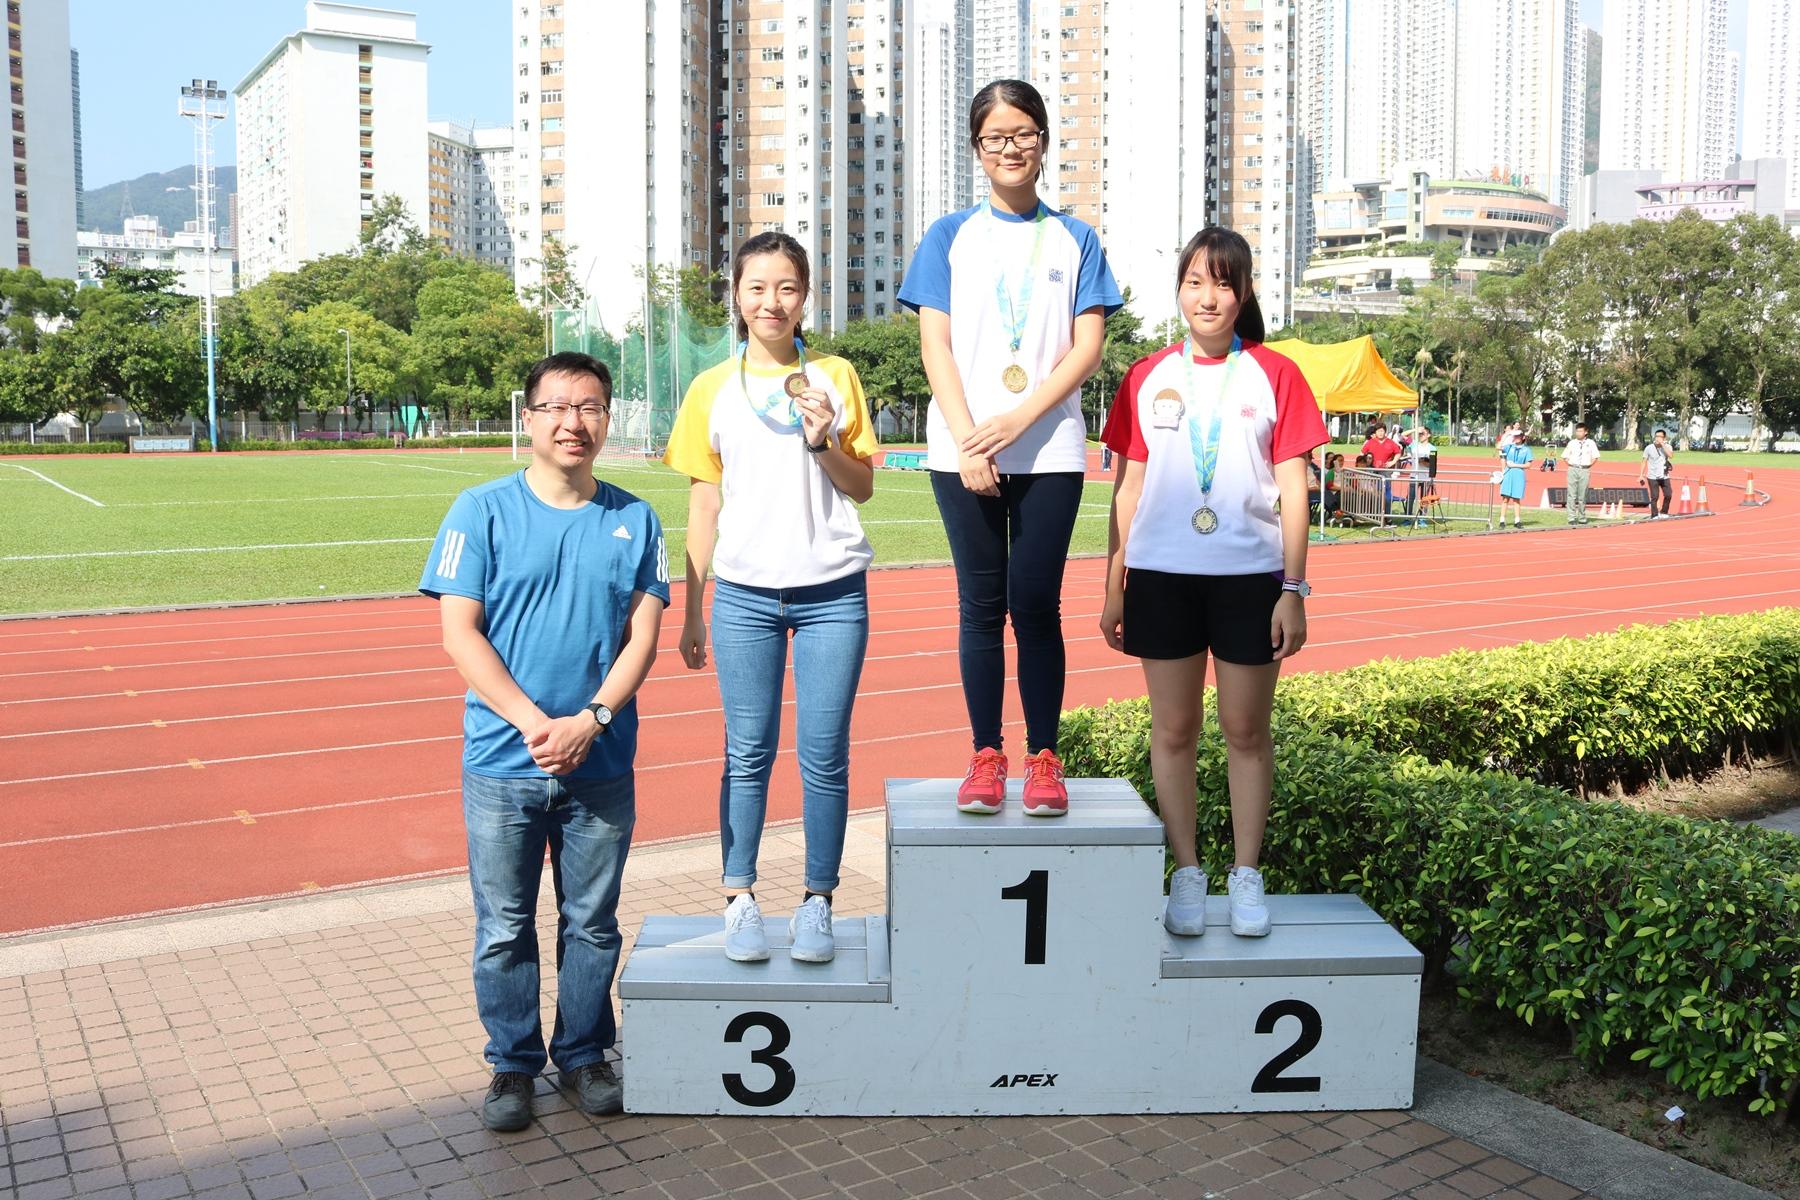 http://www.npc.edu.hk/sites/default/files/img_5787.jpg